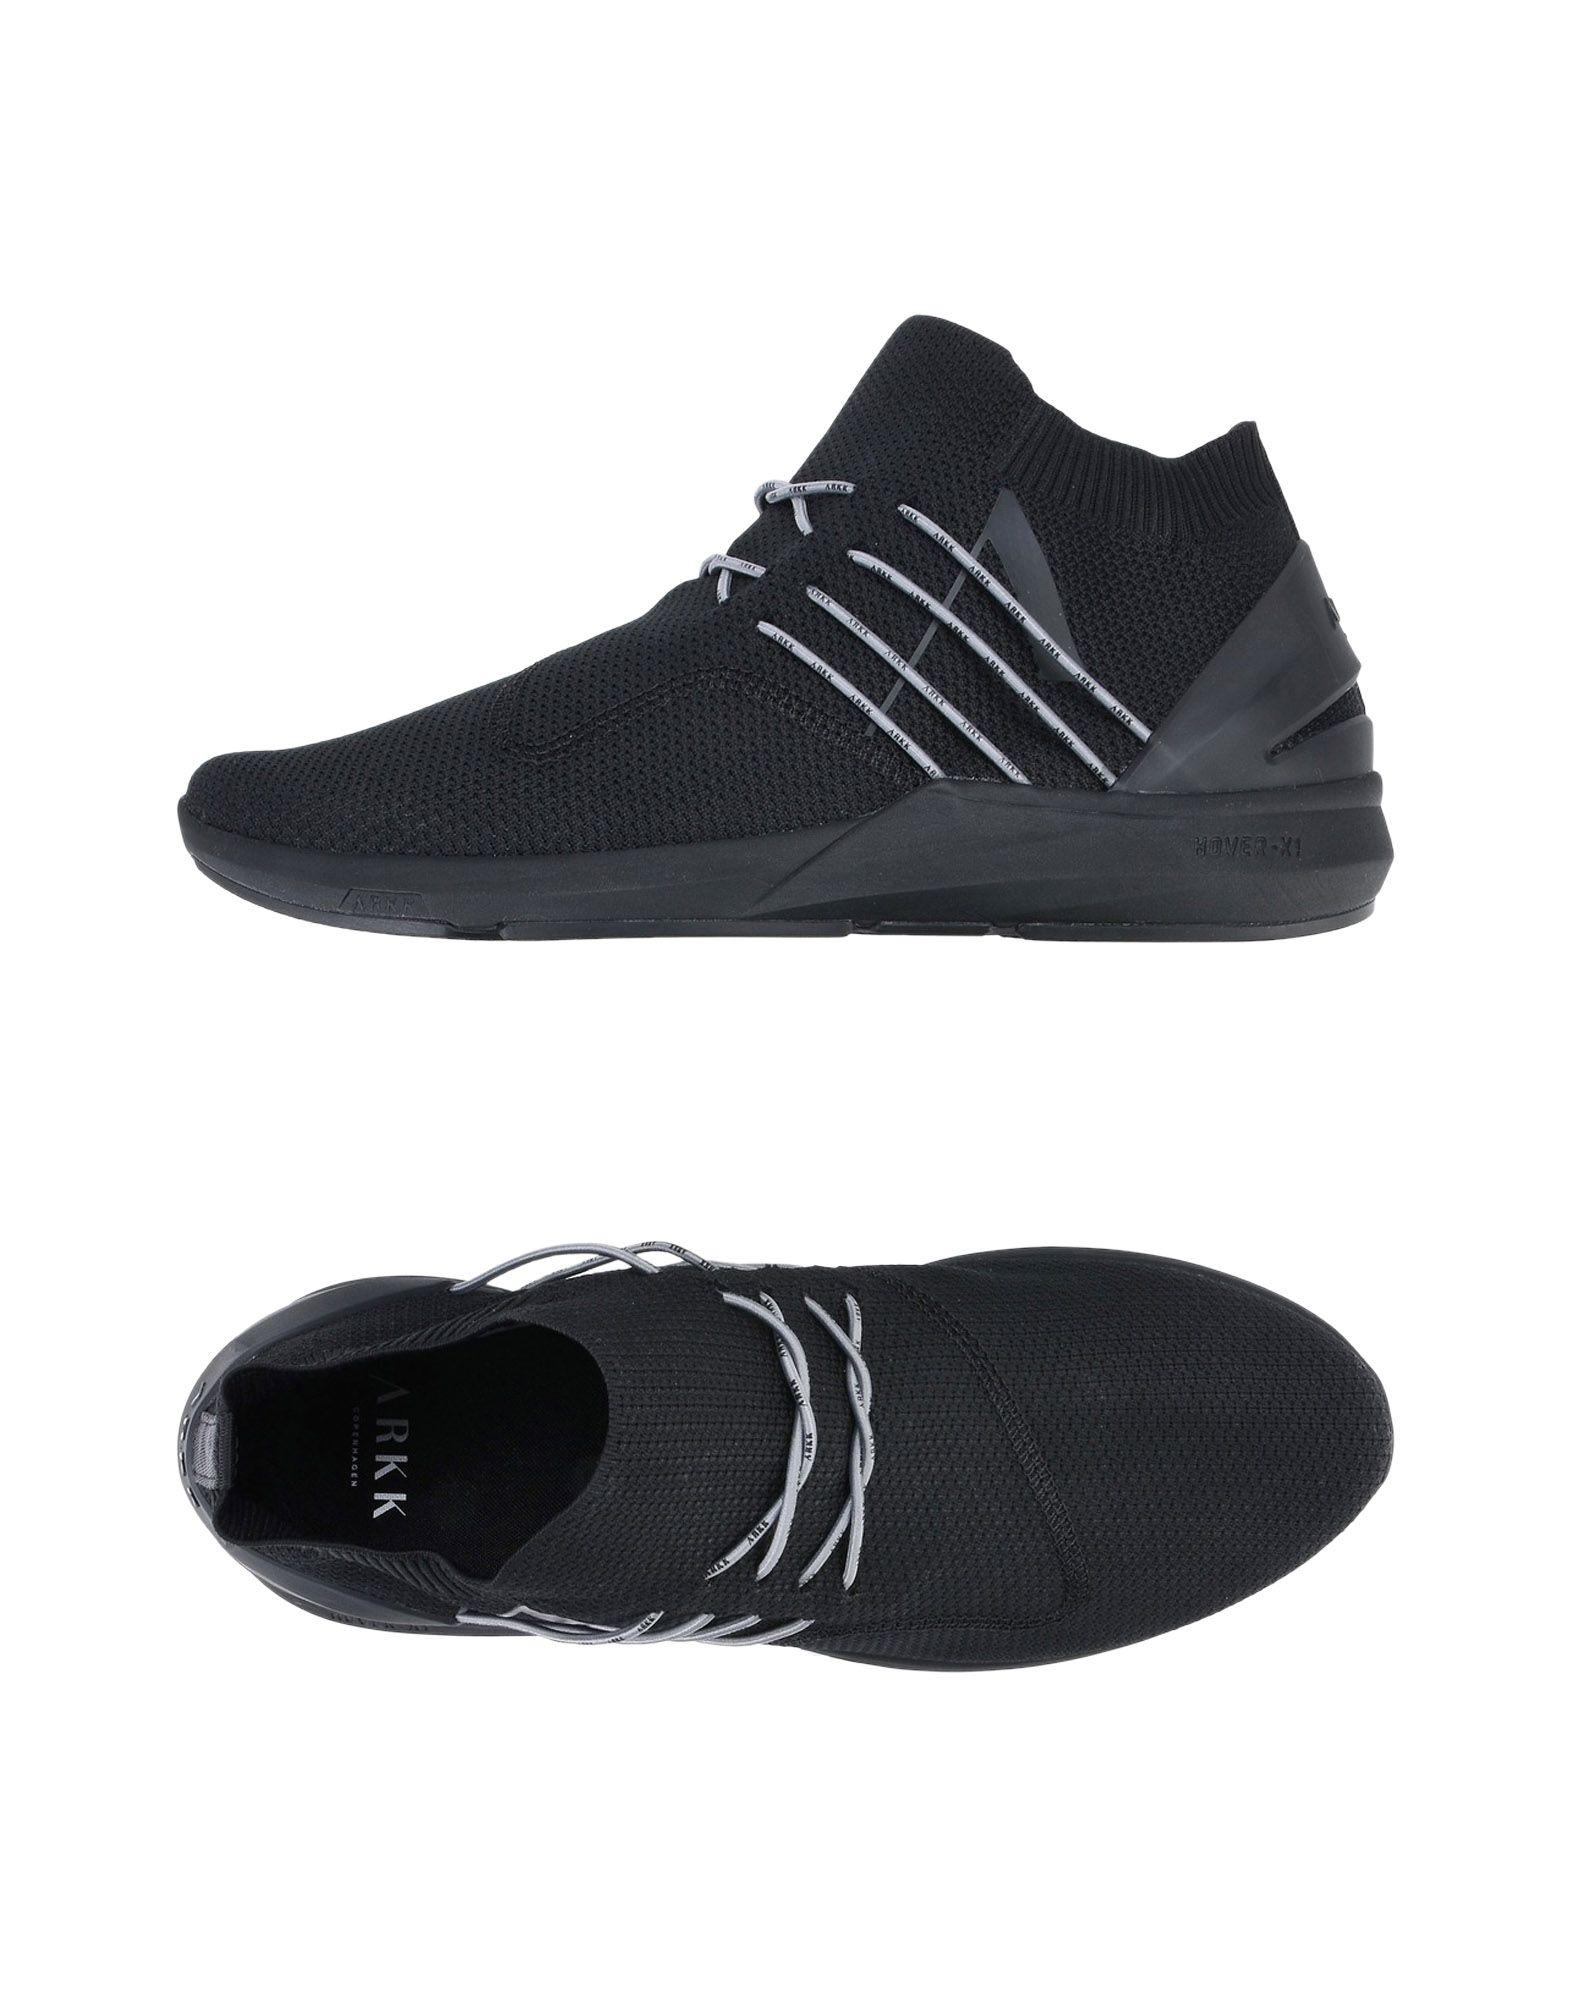 Sneakers Arkk Copenhagen Spyqon Fg H-X1 Black - Uomo - Acquista online su